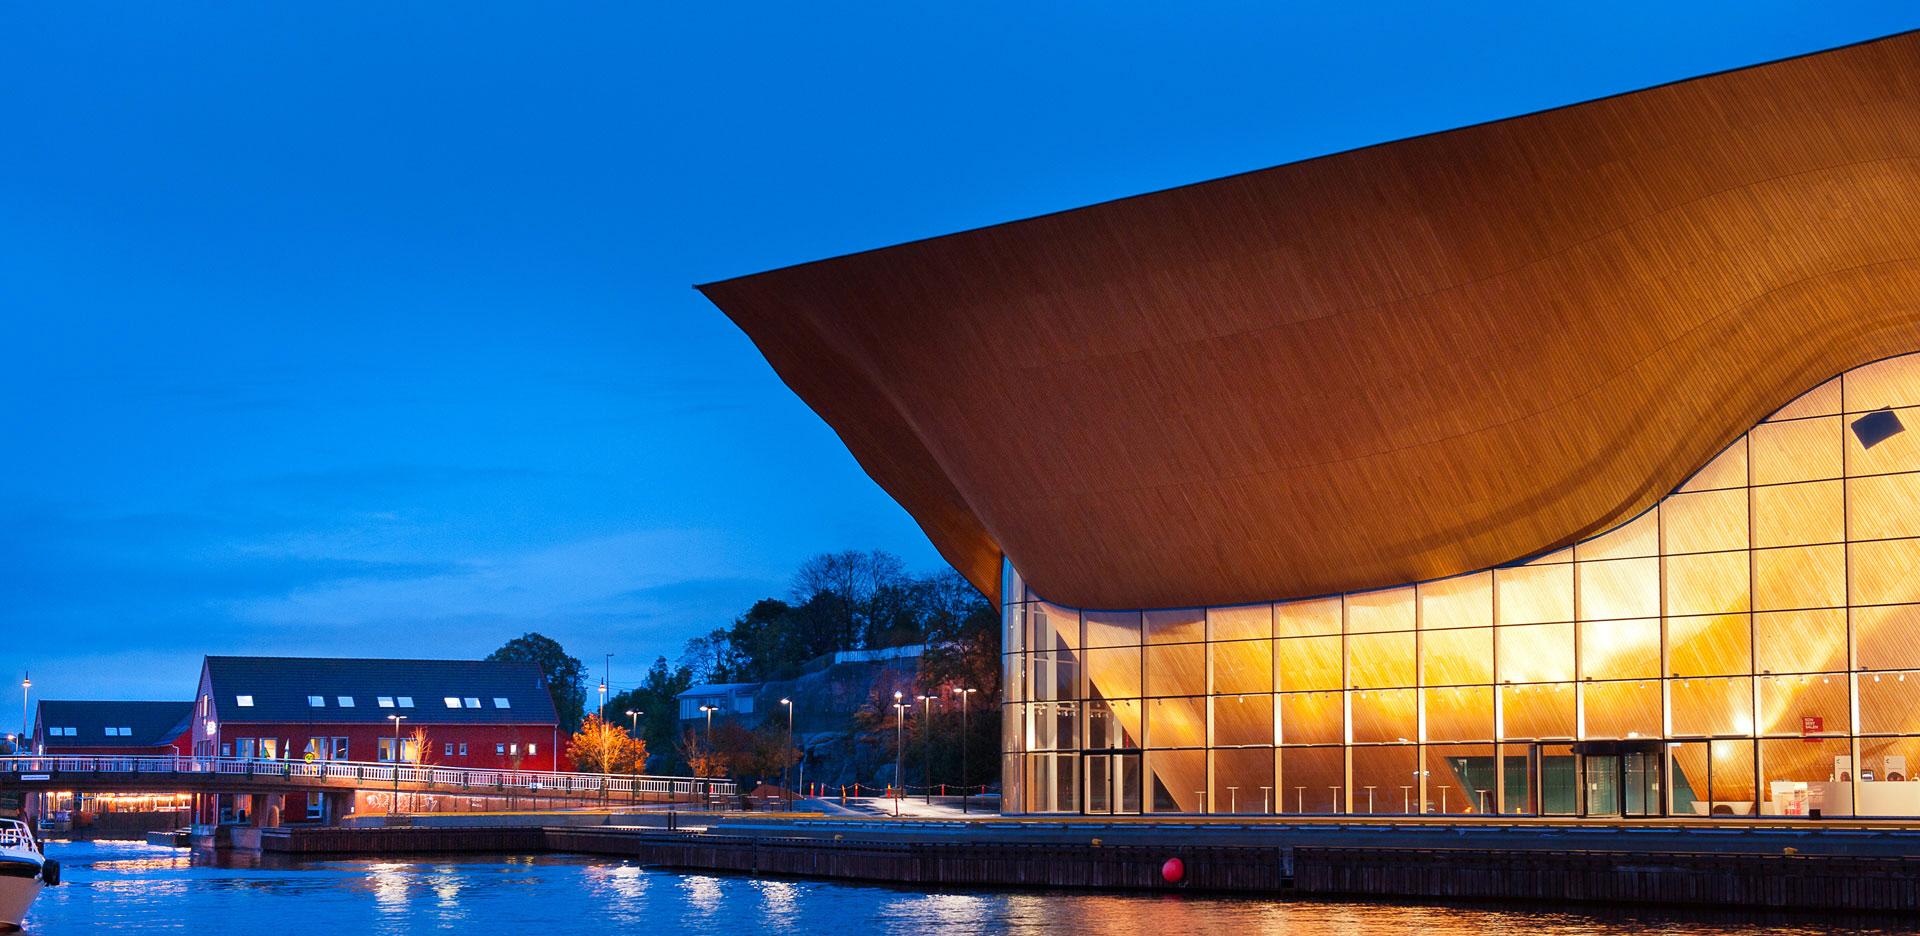 Kilden-Kristiansand-Performing-Arts-Centre-Norway-